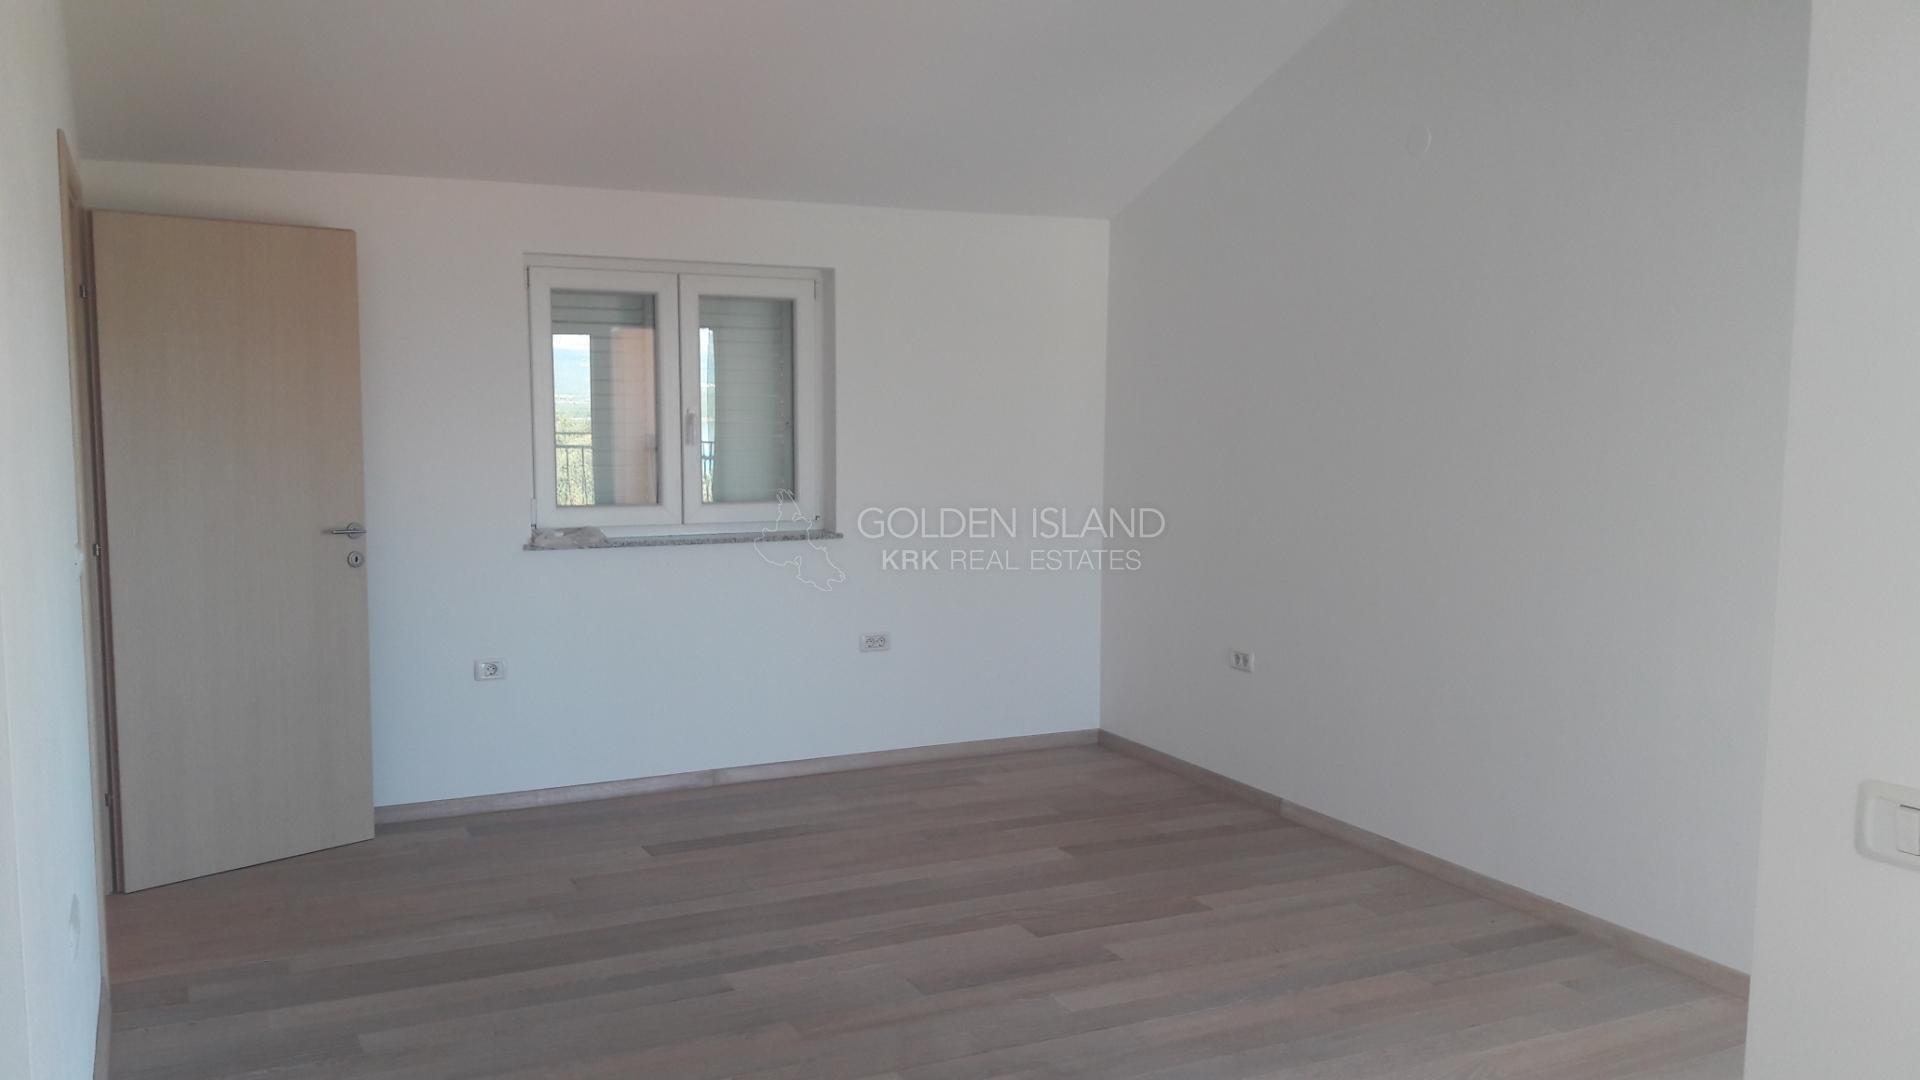 Soline, prekrasan apartman 300 m od mora!